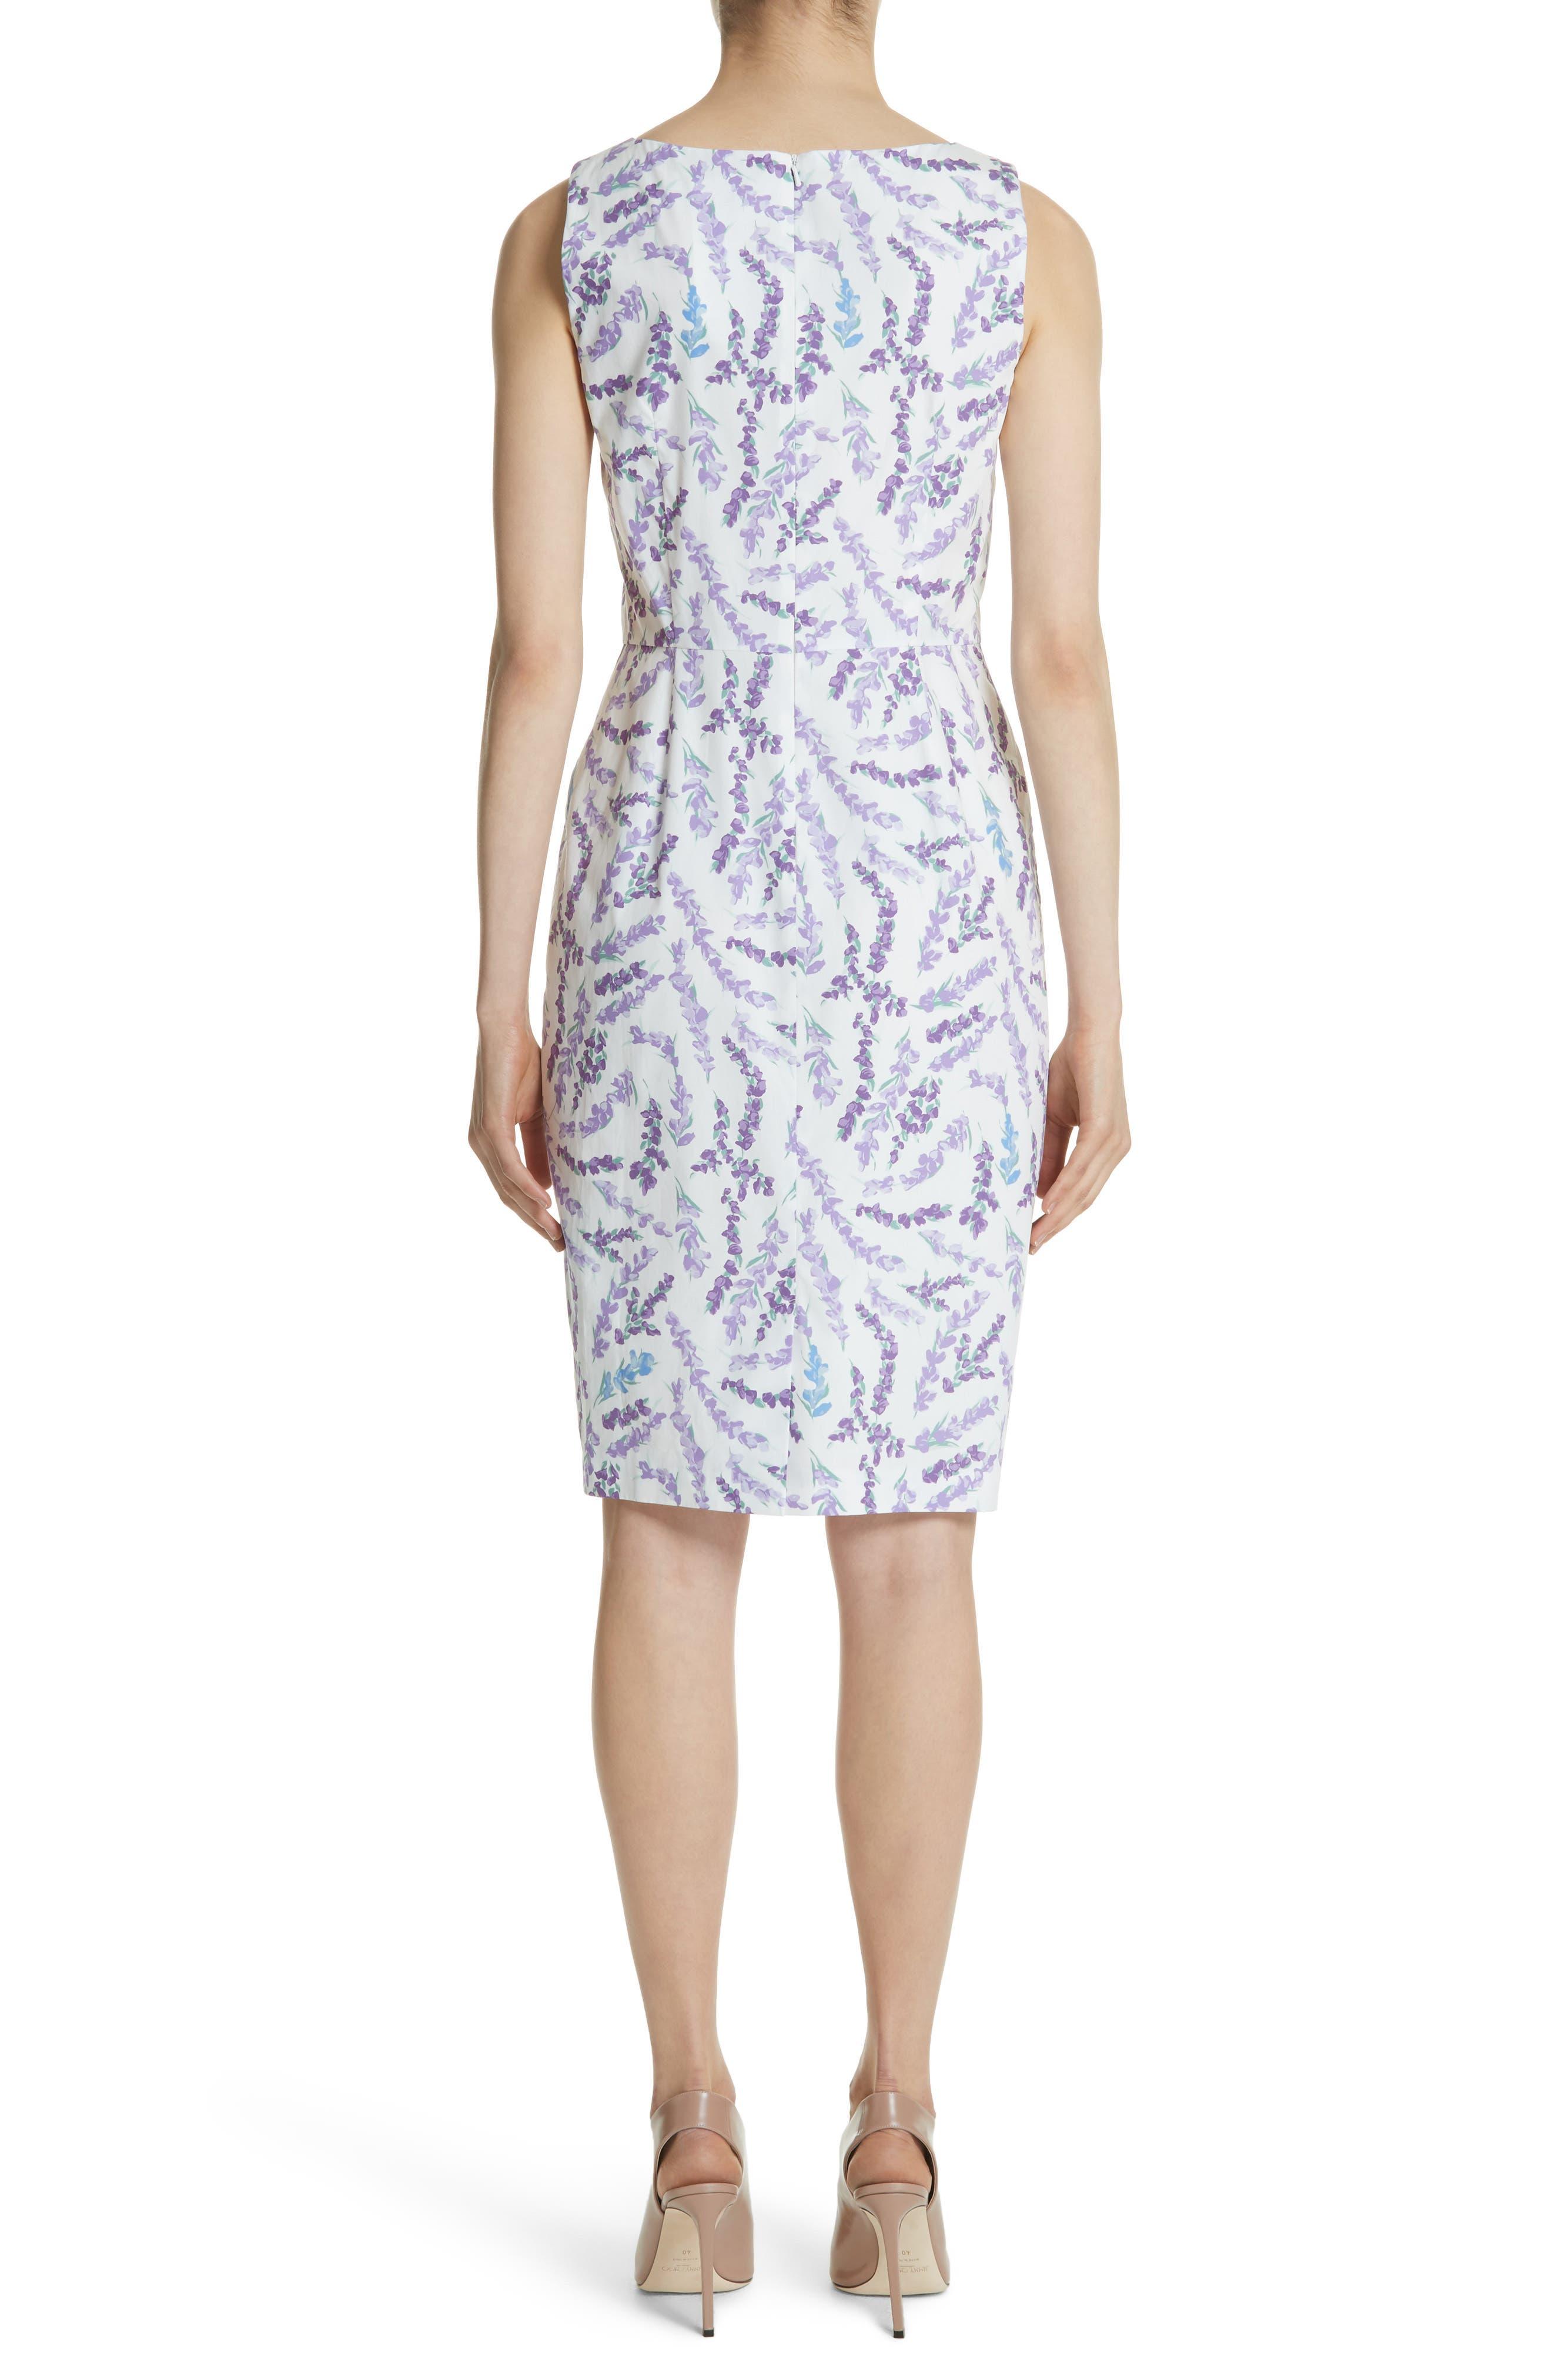 Melfi Print Cotton Sheath Dress,                             Alternate thumbnail 2, color,                             Lavender